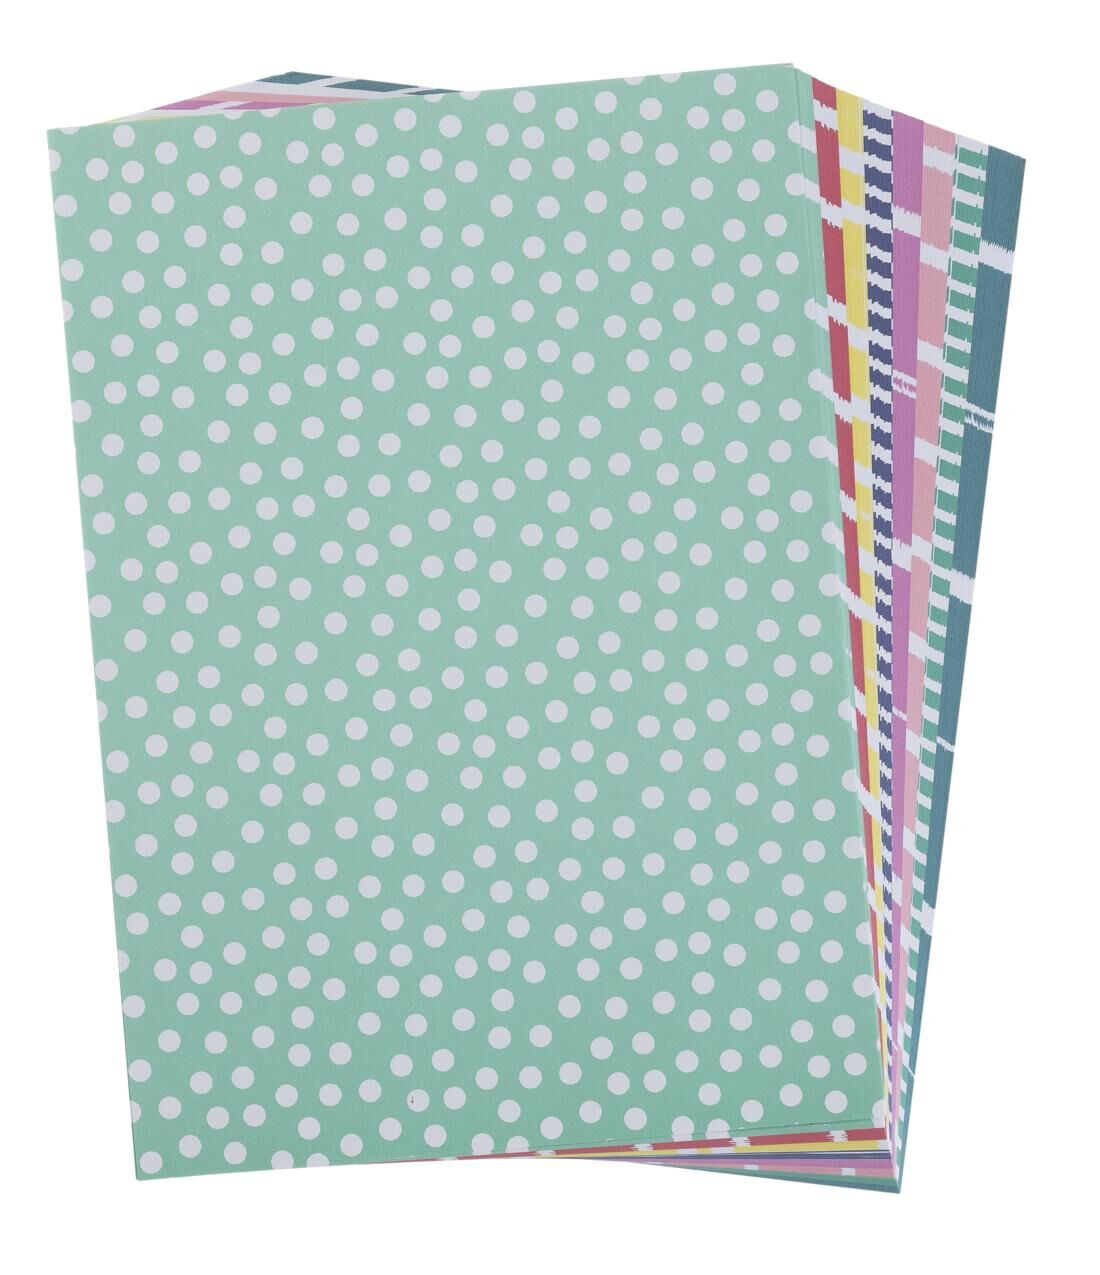 Buntes Musterpapier bei Gemustertes Tonpapier